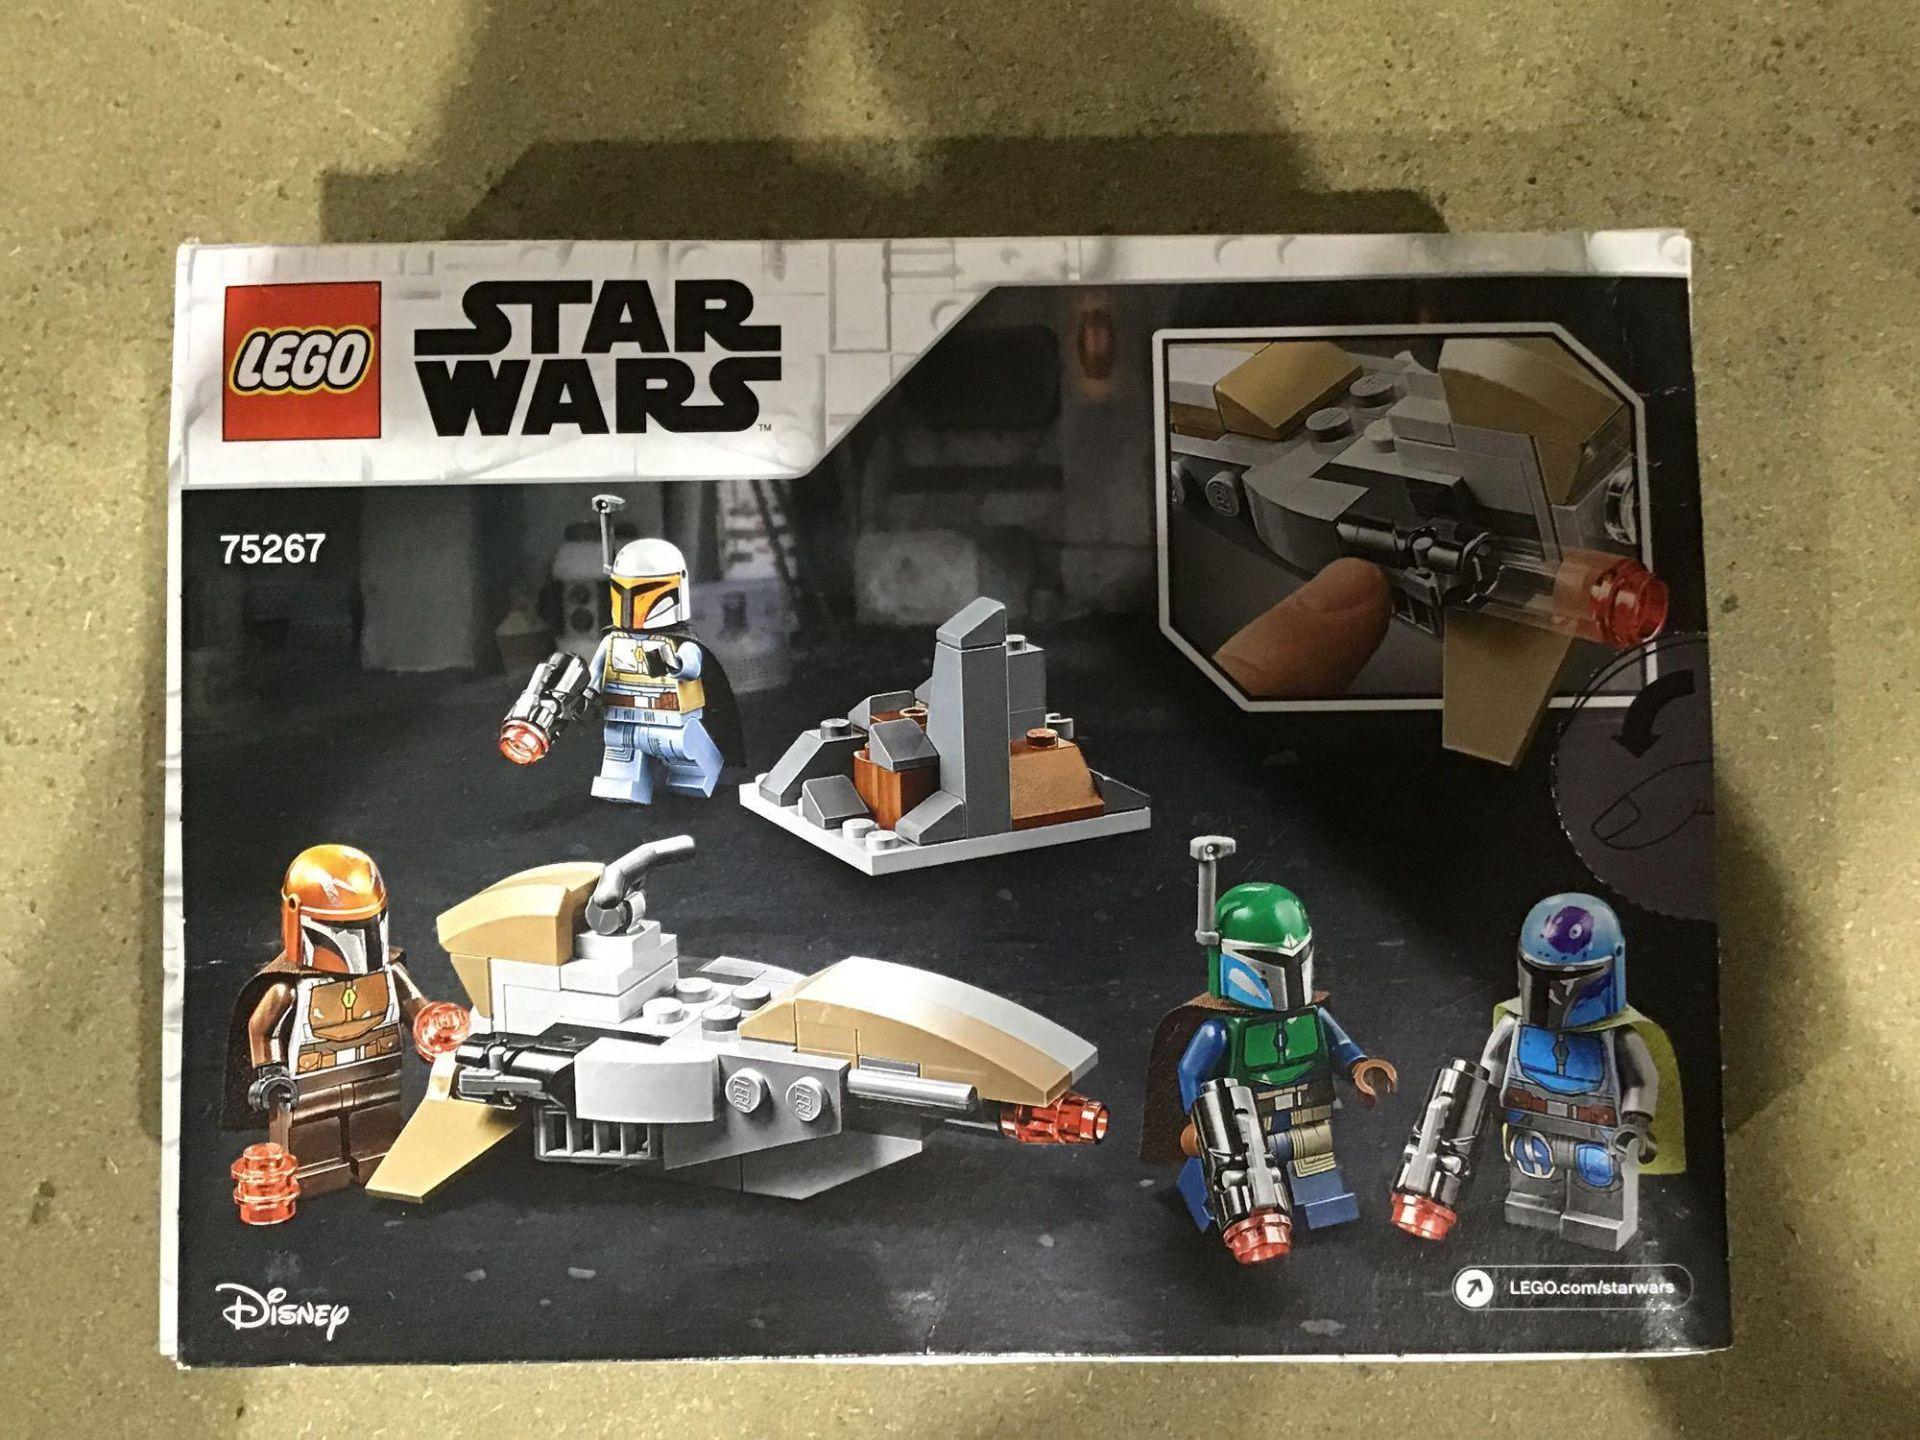 LEGO Star Wars Mandalorian Battle Pack Building Set - 75267 (337/0500) - £13.00 RRP - Image 3 of 4